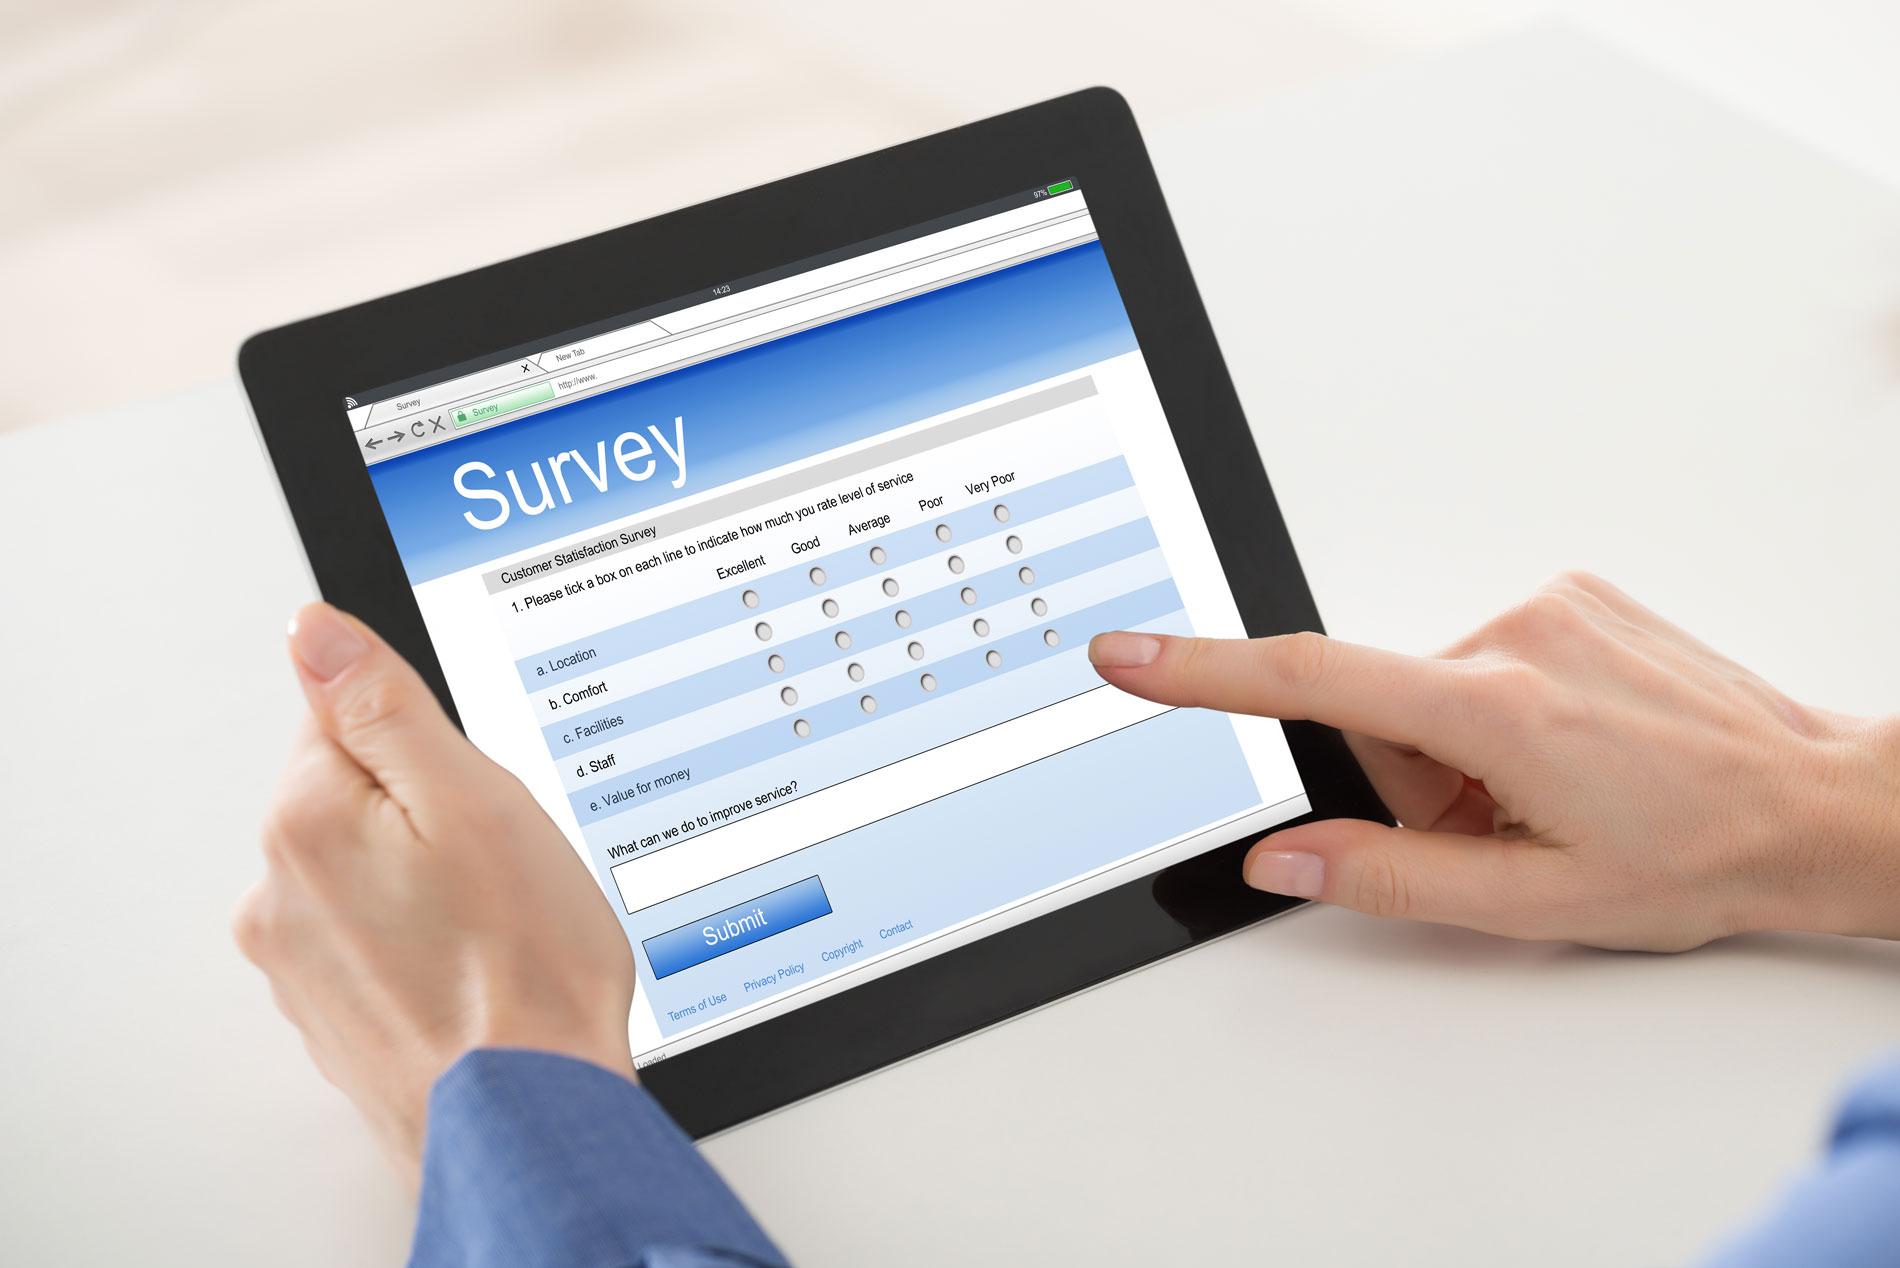 online survey on a tablet